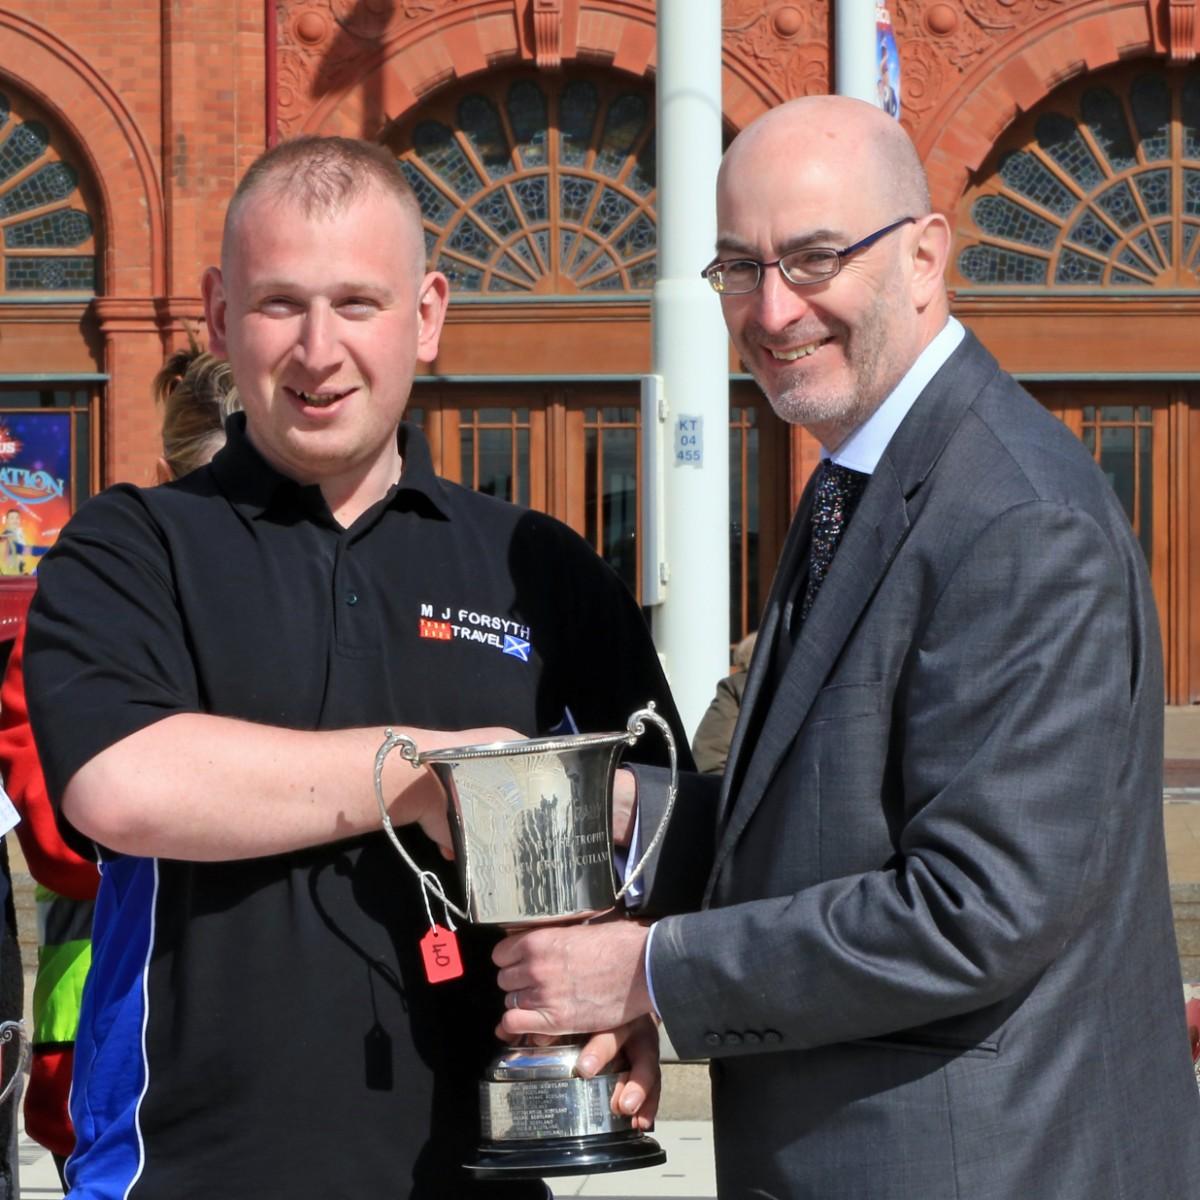 Tony Roose Trophy - MJ Forsyth Travel